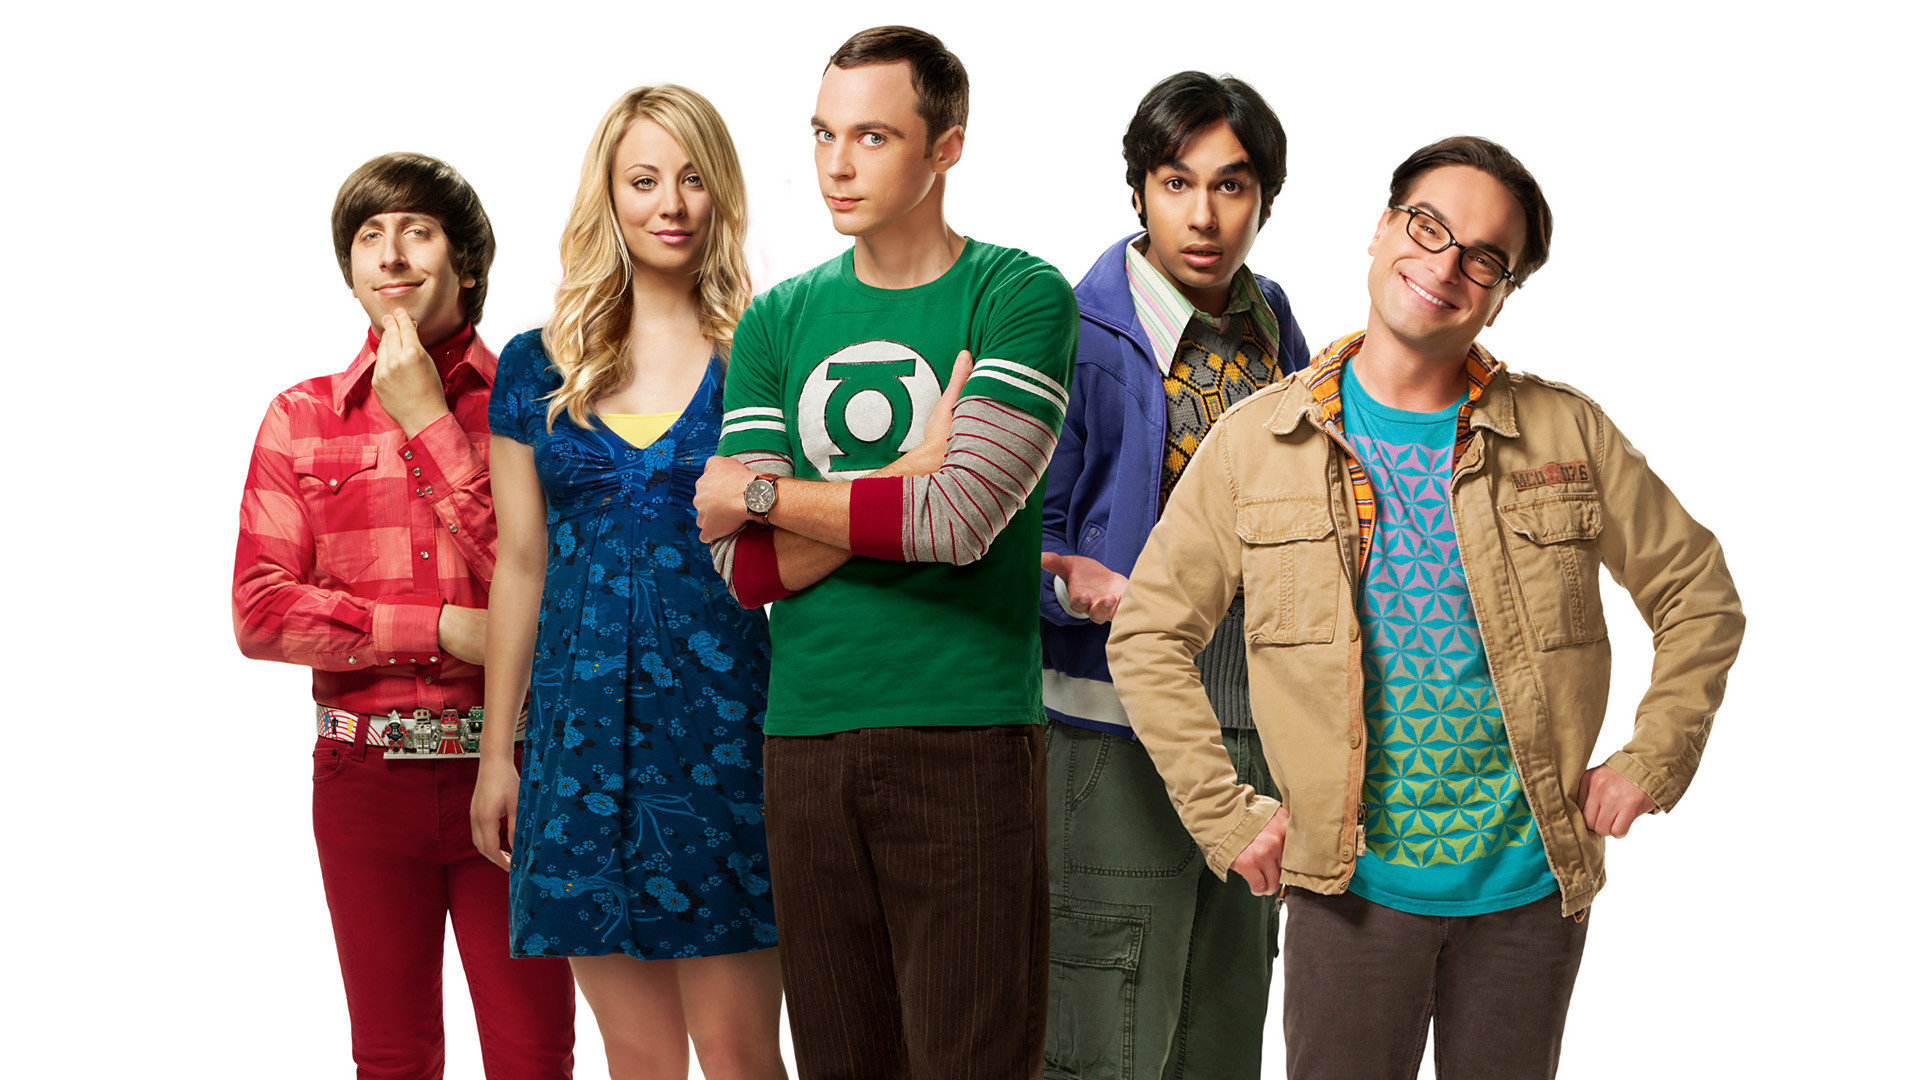 Free Download The Big Bang Theory Wallpaper ID423025 Hd 1920x1080 For Desktop